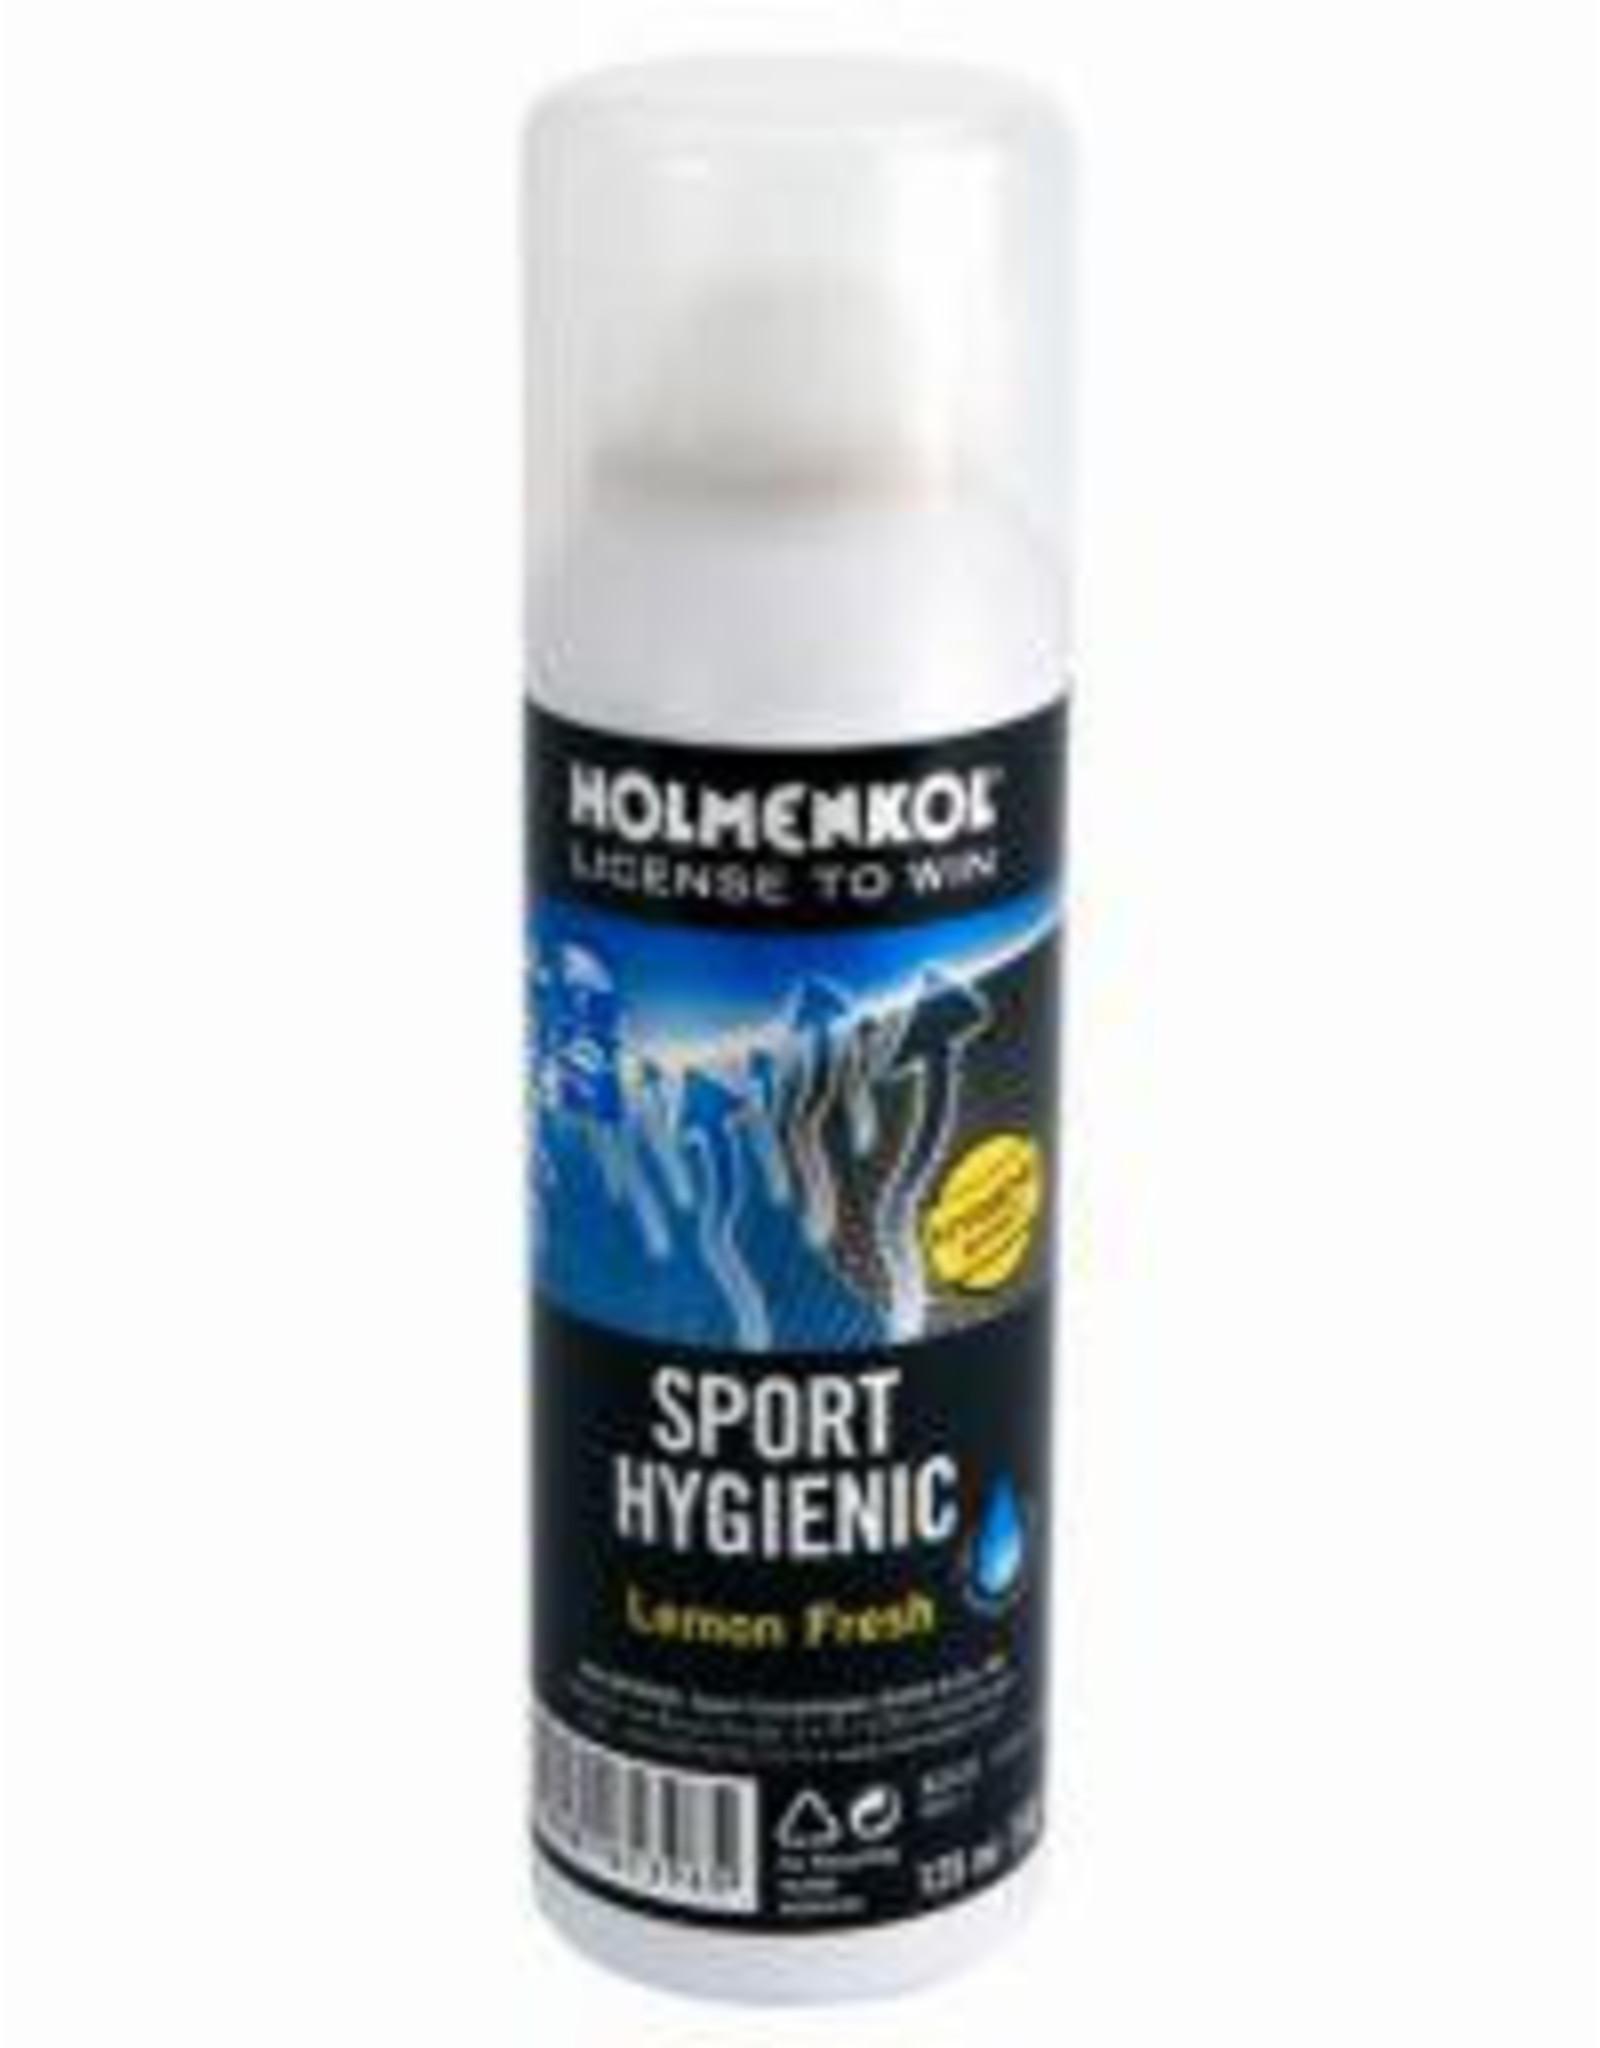 Holmenkol Holmenkol Sport Hygienic